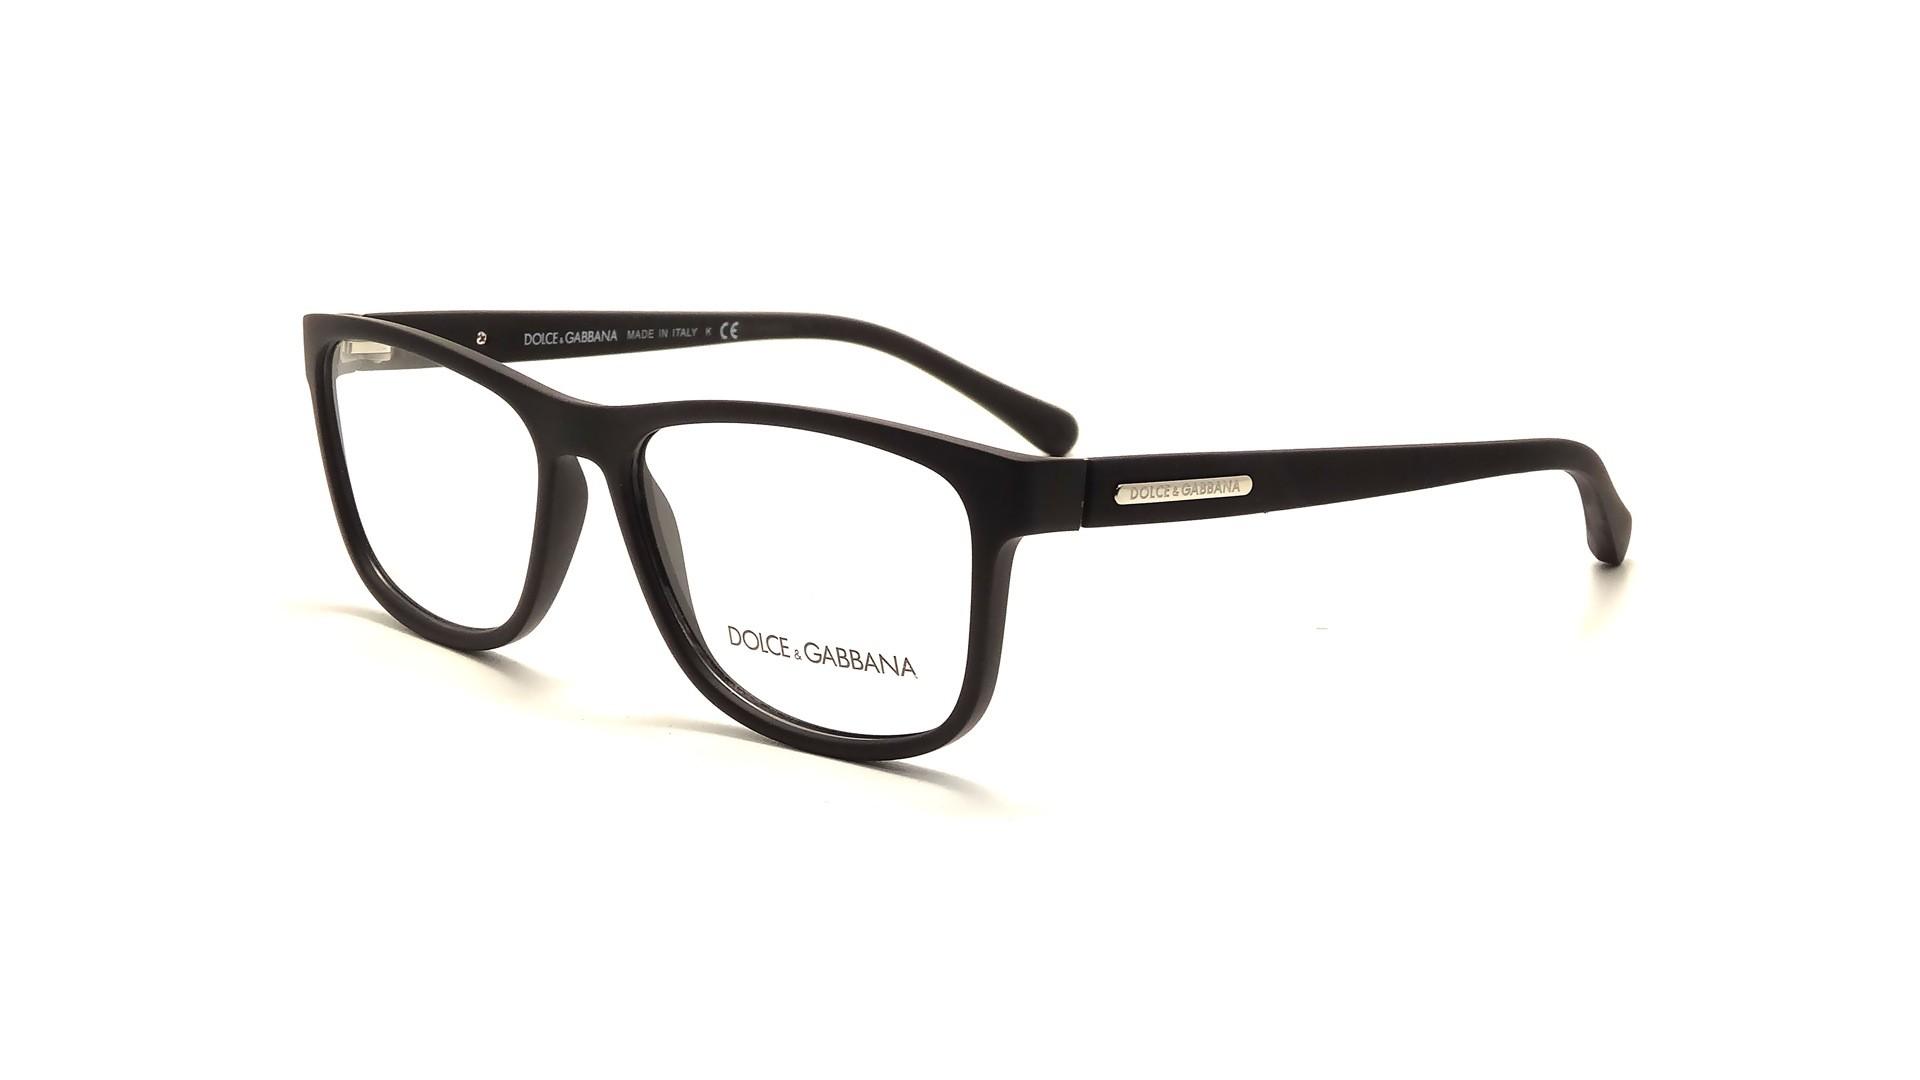 5584f89db90e DIOPTA - Optical Stores